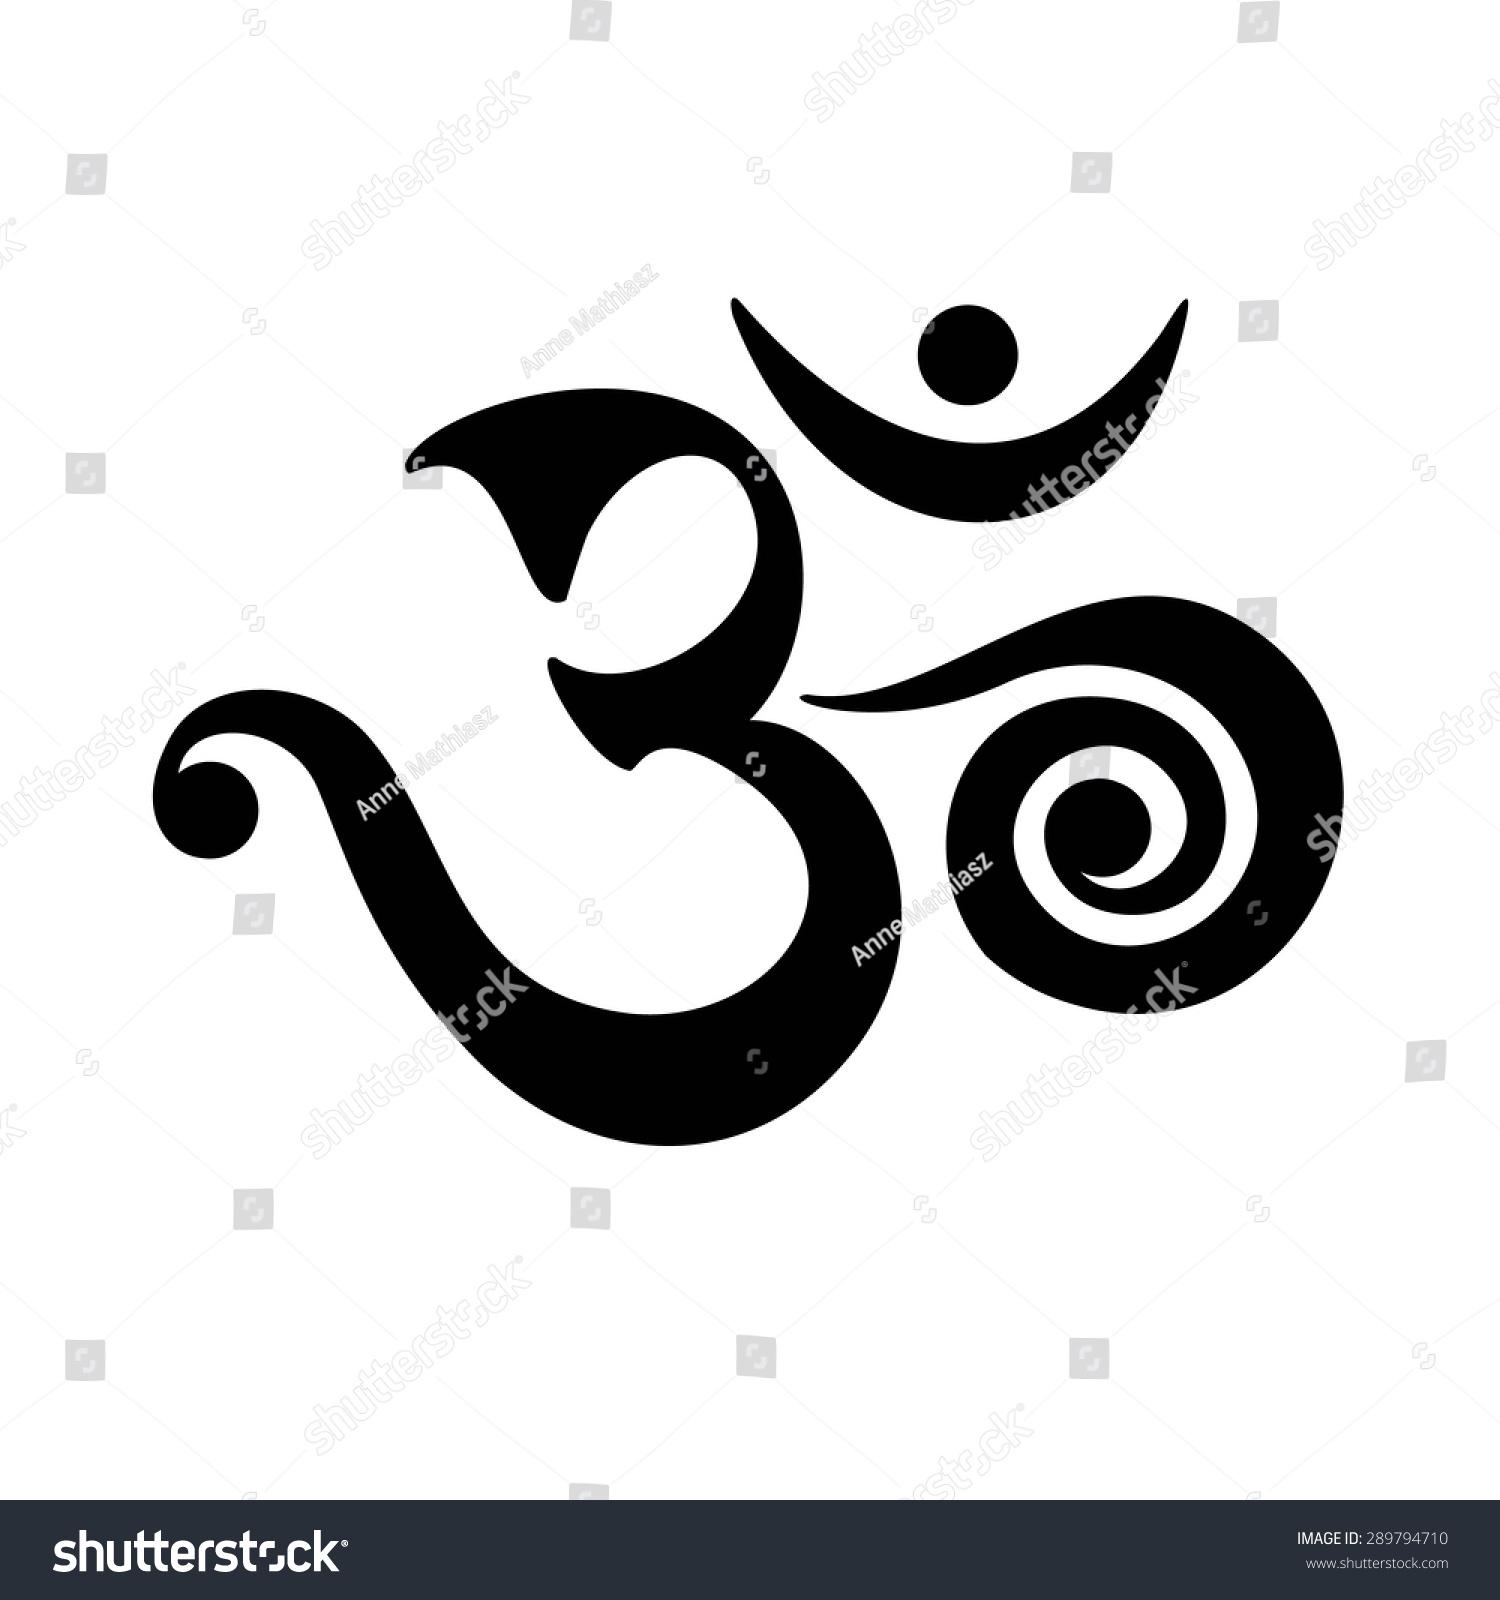 Om mantra spiritual symbol buddhism stock vector 289794710 om mantra spiritual symbol buddhism biocorpaavc Choice Image